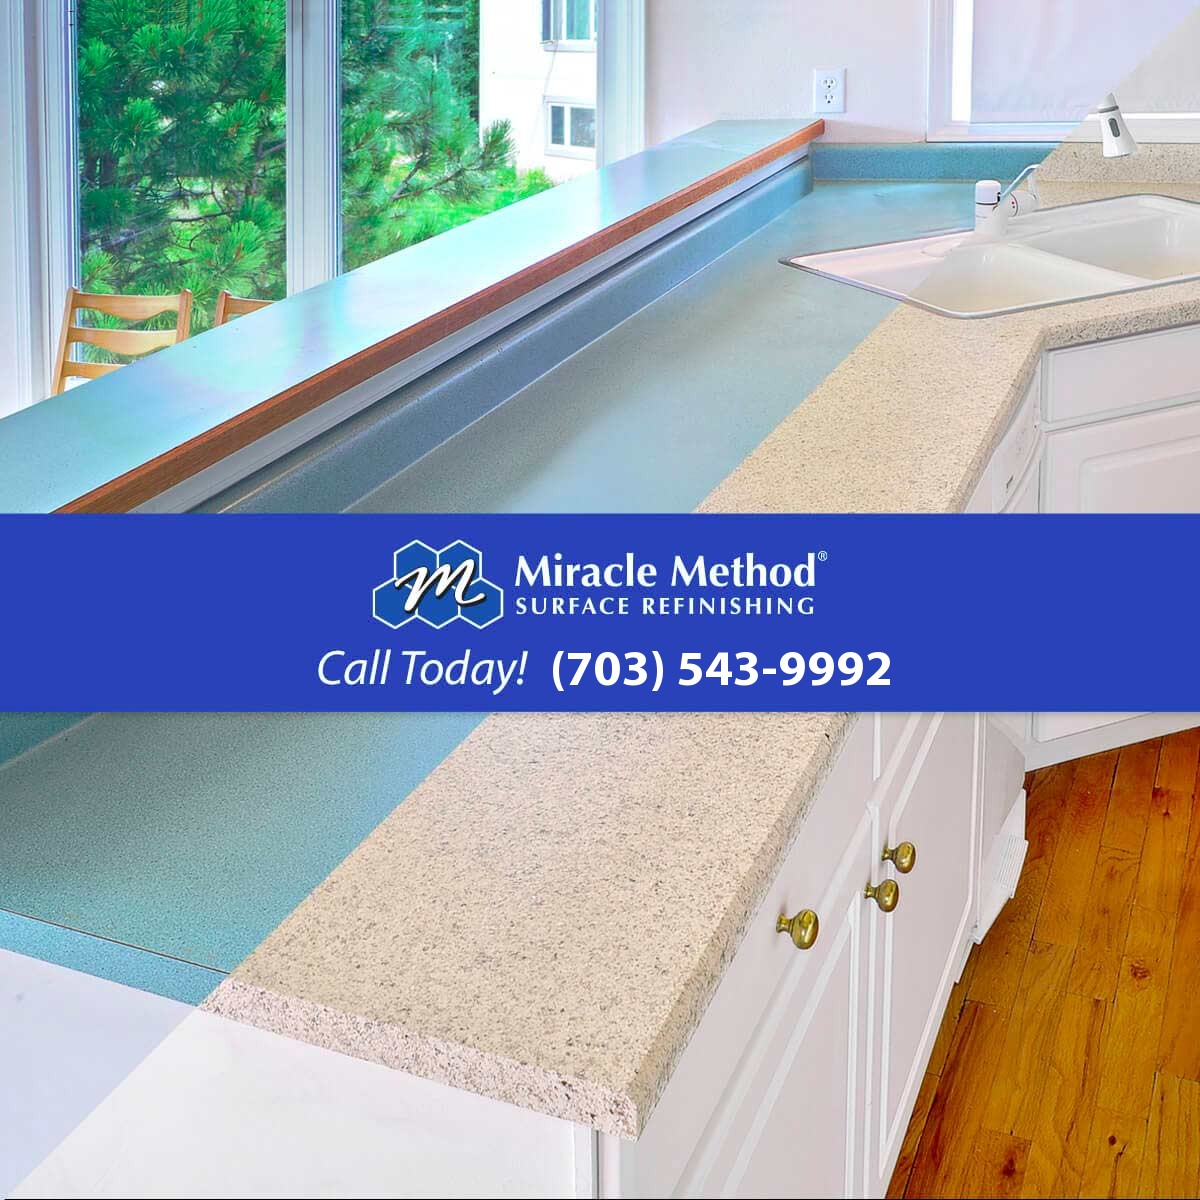 Manassas, VA Surface Refinishing & Repair | Miracle Method of Fairfax